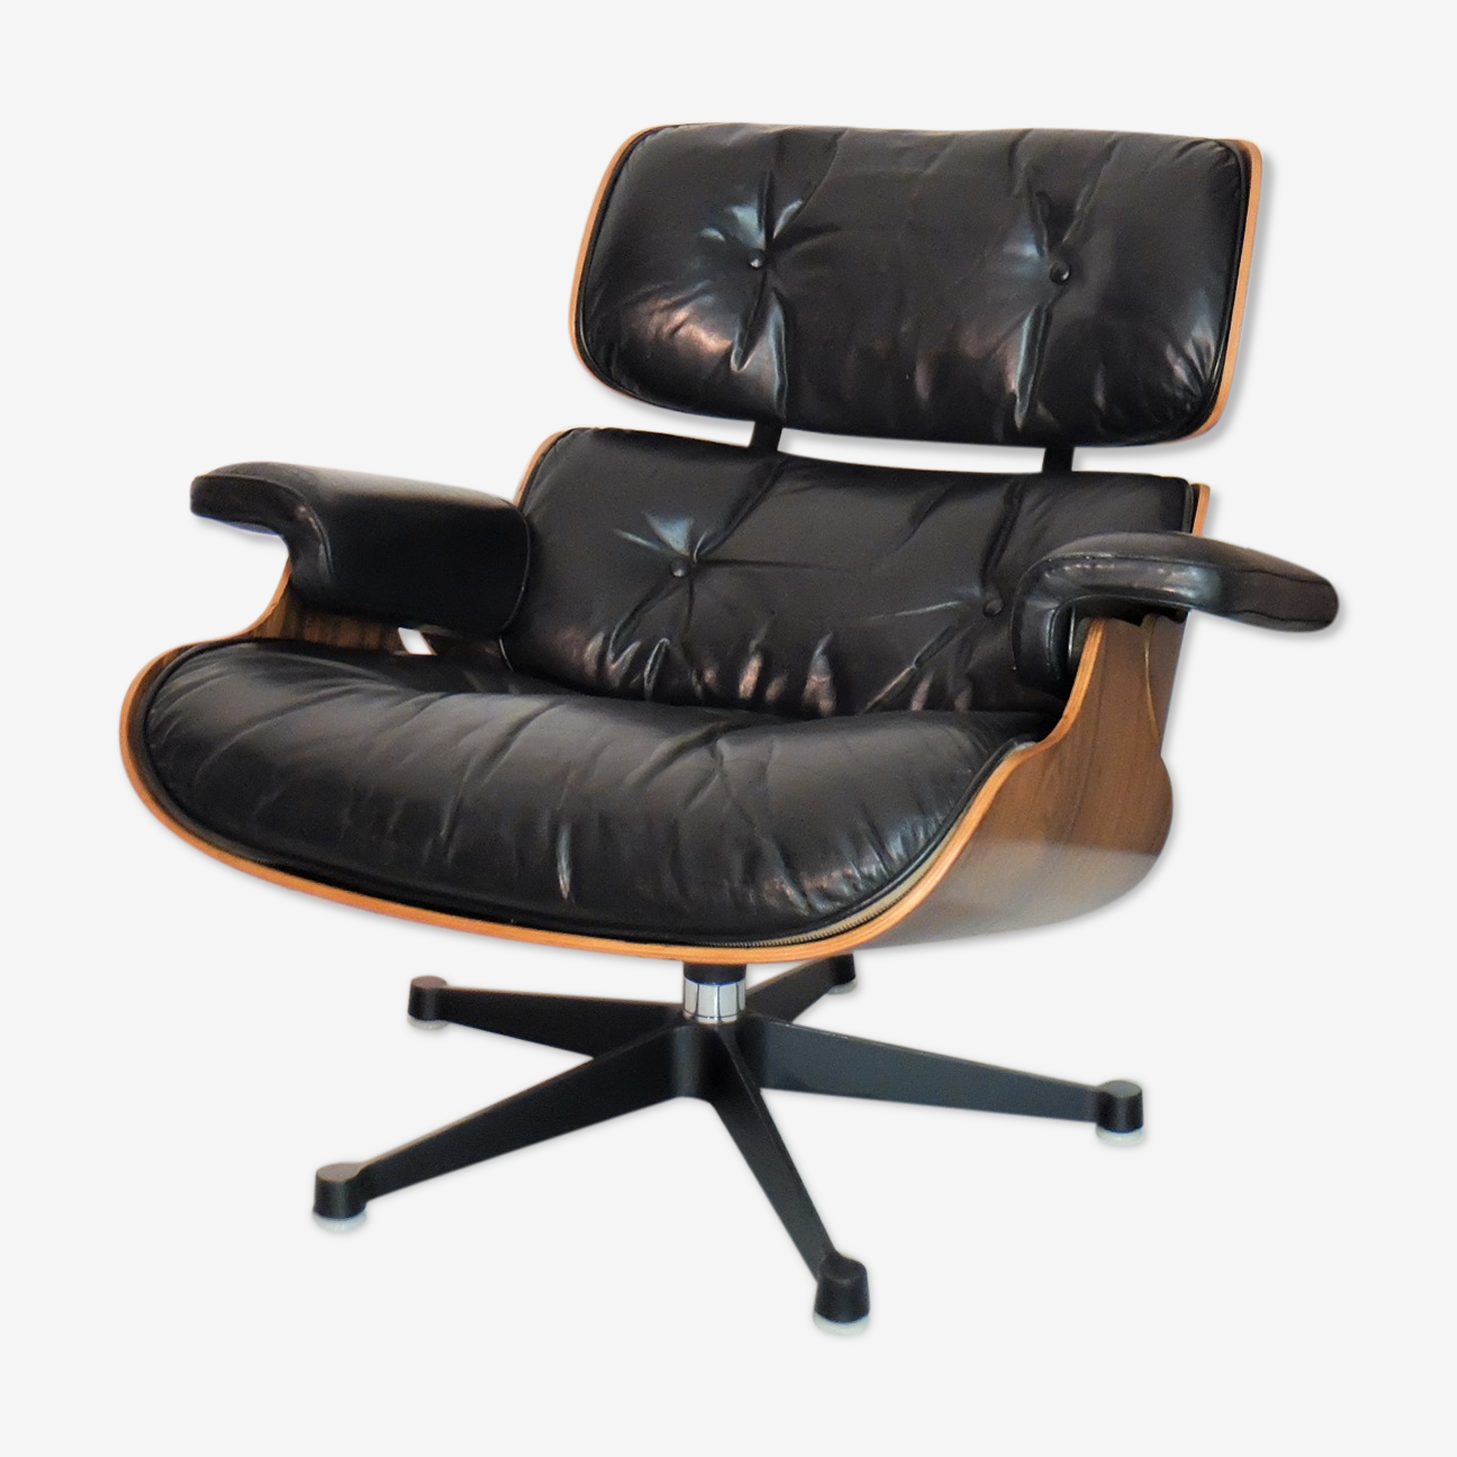 Lounge chair Eames en palissandre, mobilier international 1970